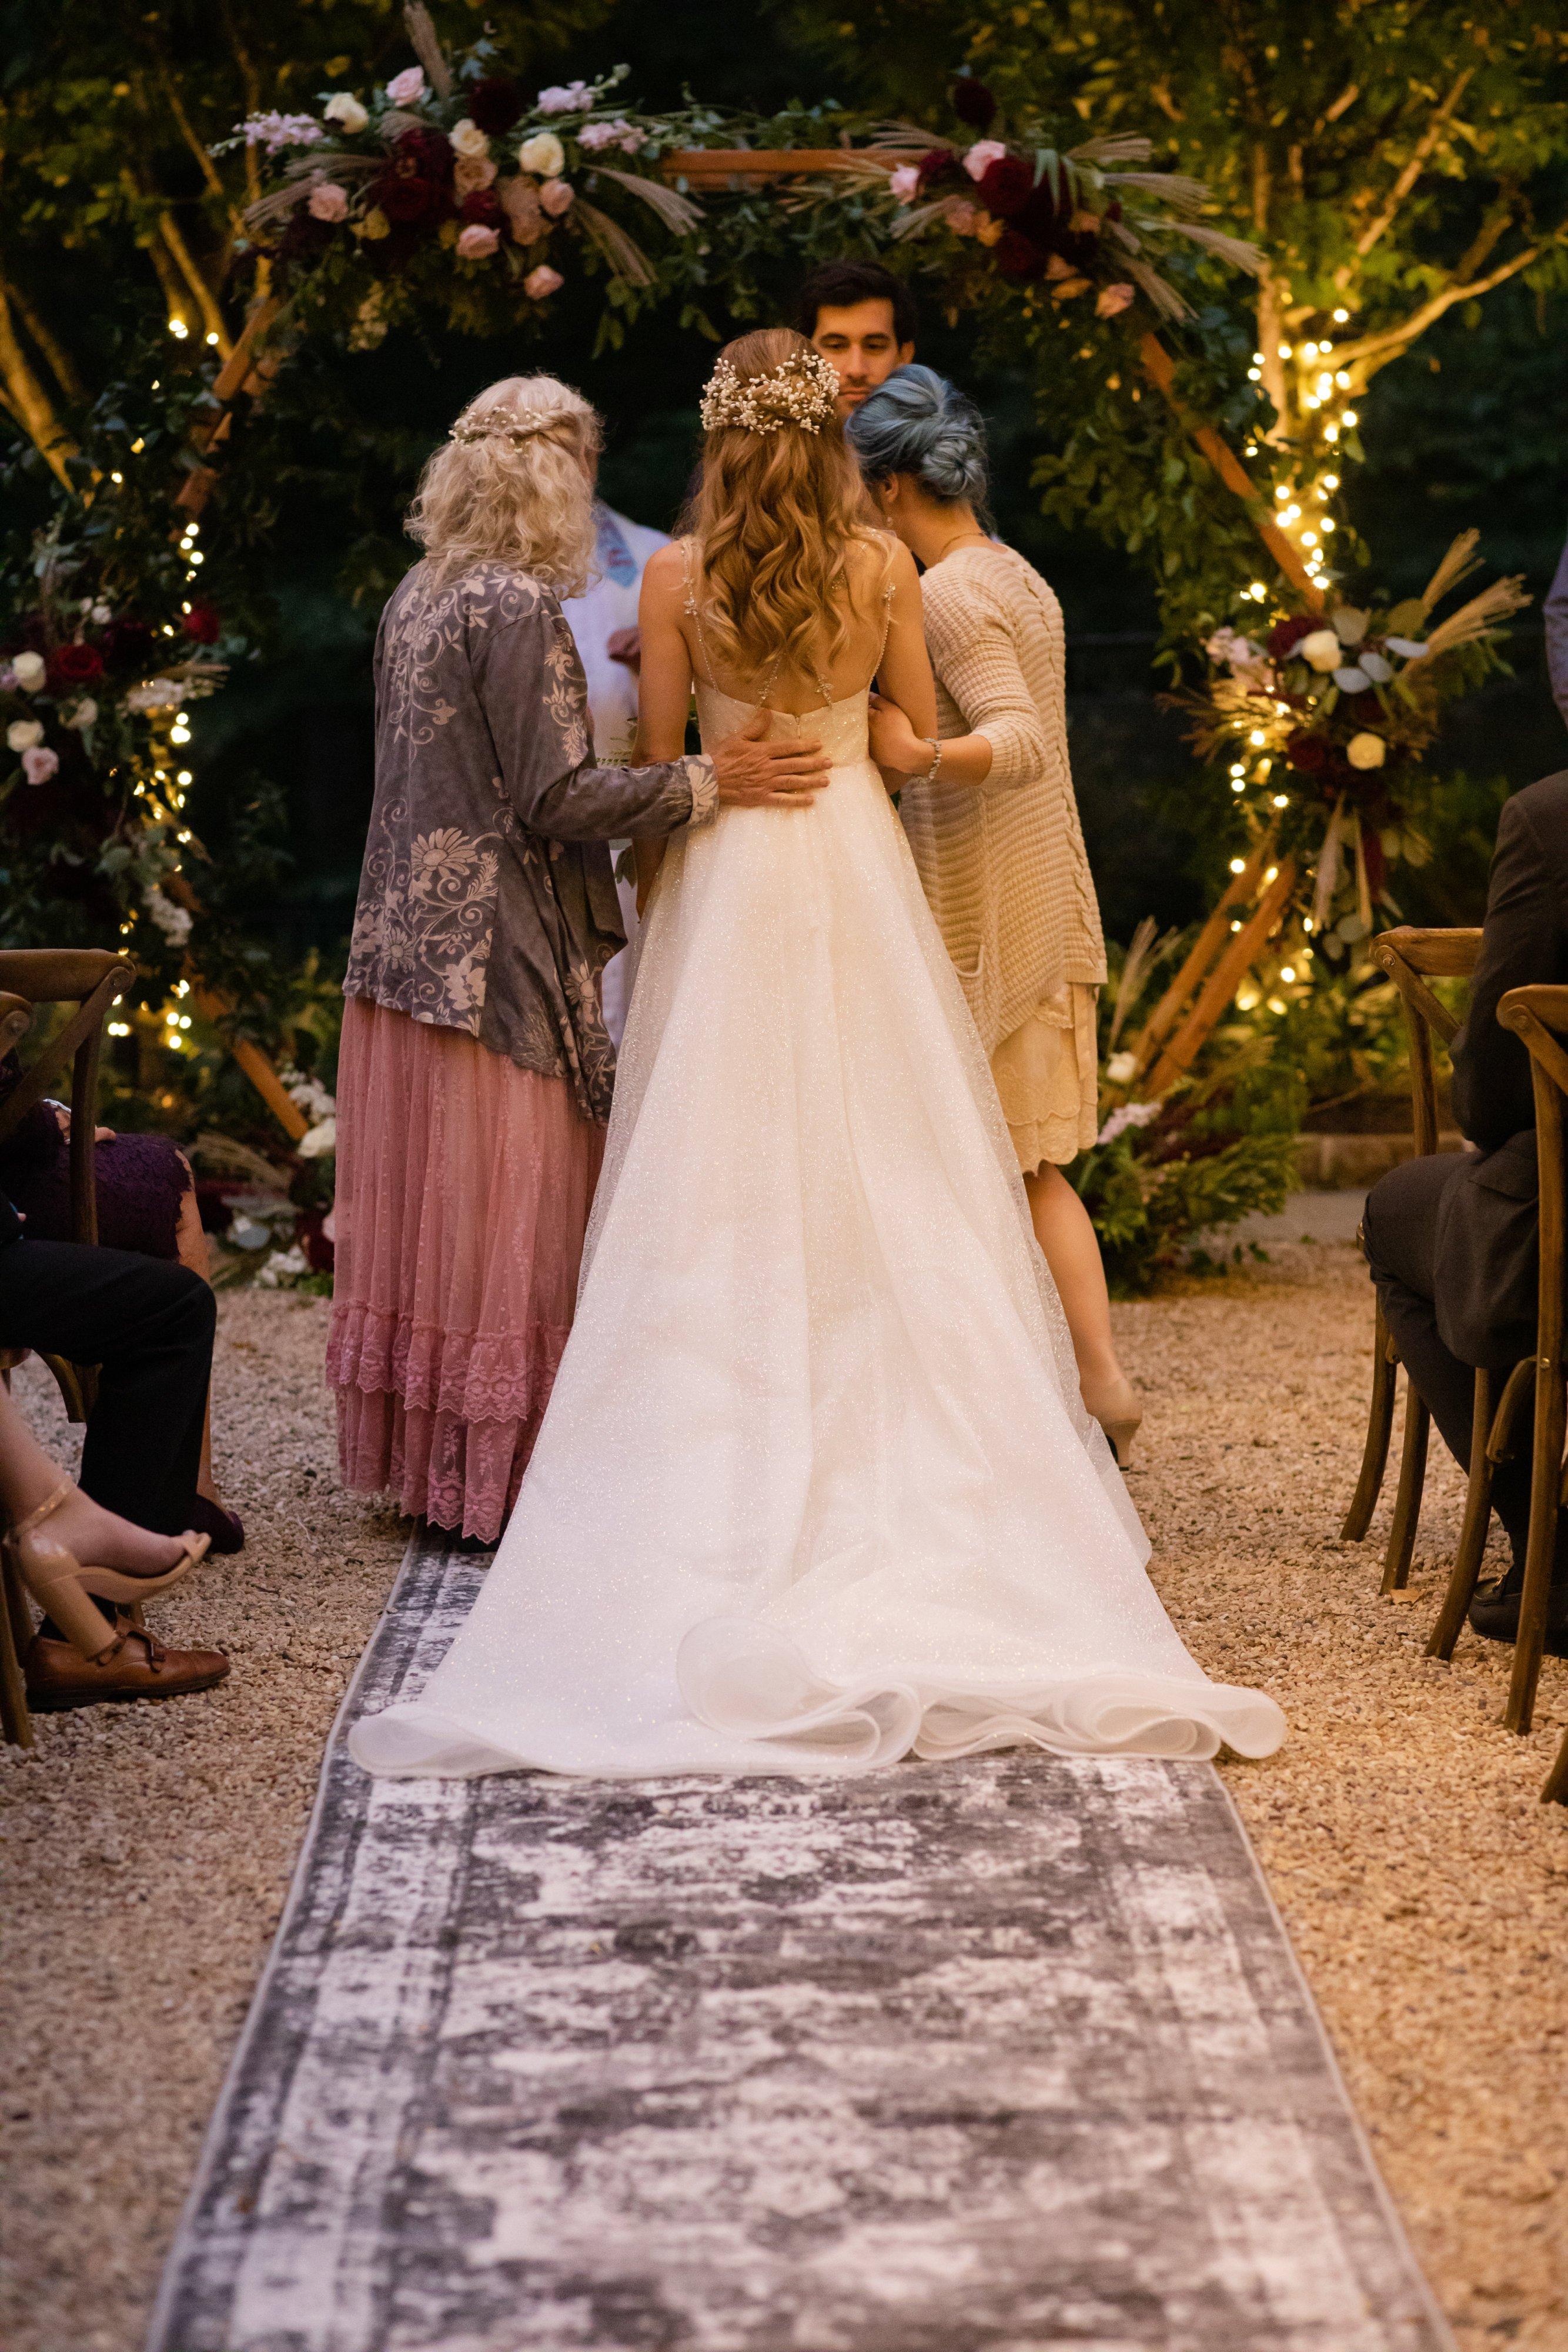 StefanieKamermanPhotography-MelanieandBenjamin-Wedding-Bethesda,MD-2019-10-12-244